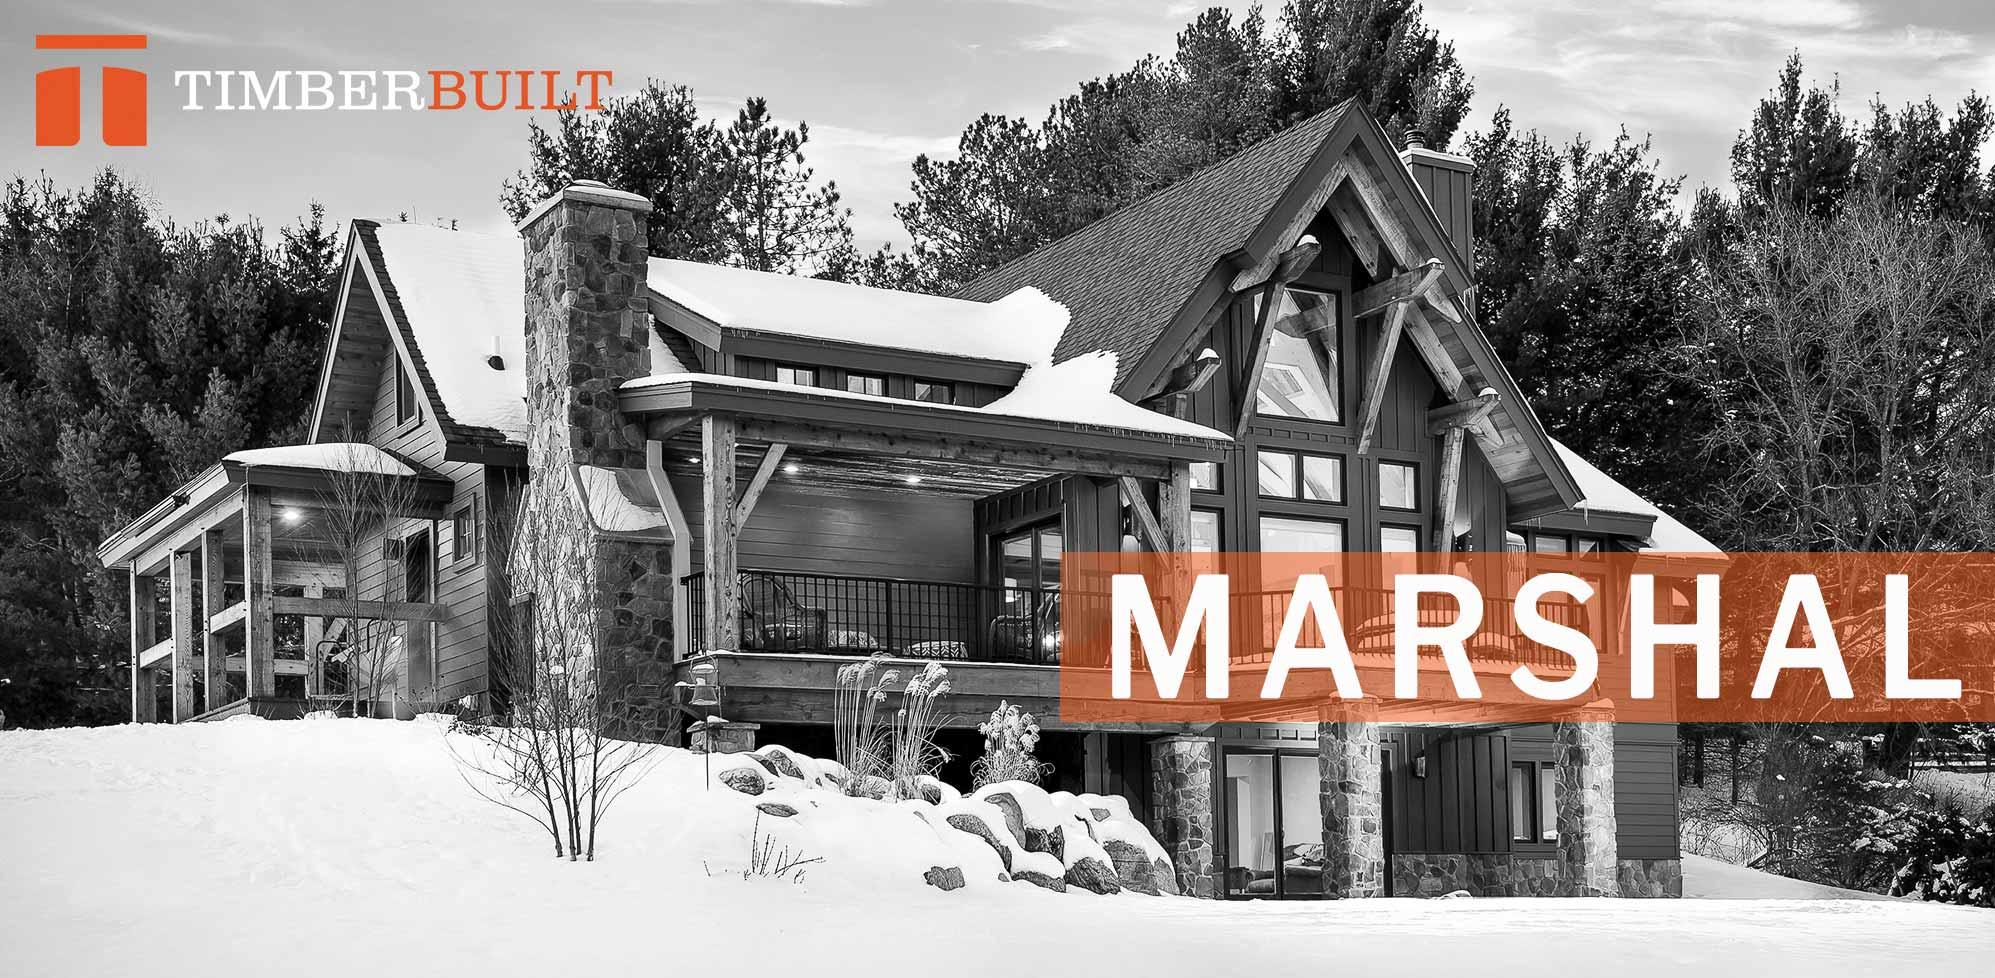 Timber Frame Home Designs | Marshal | Timberbuilt